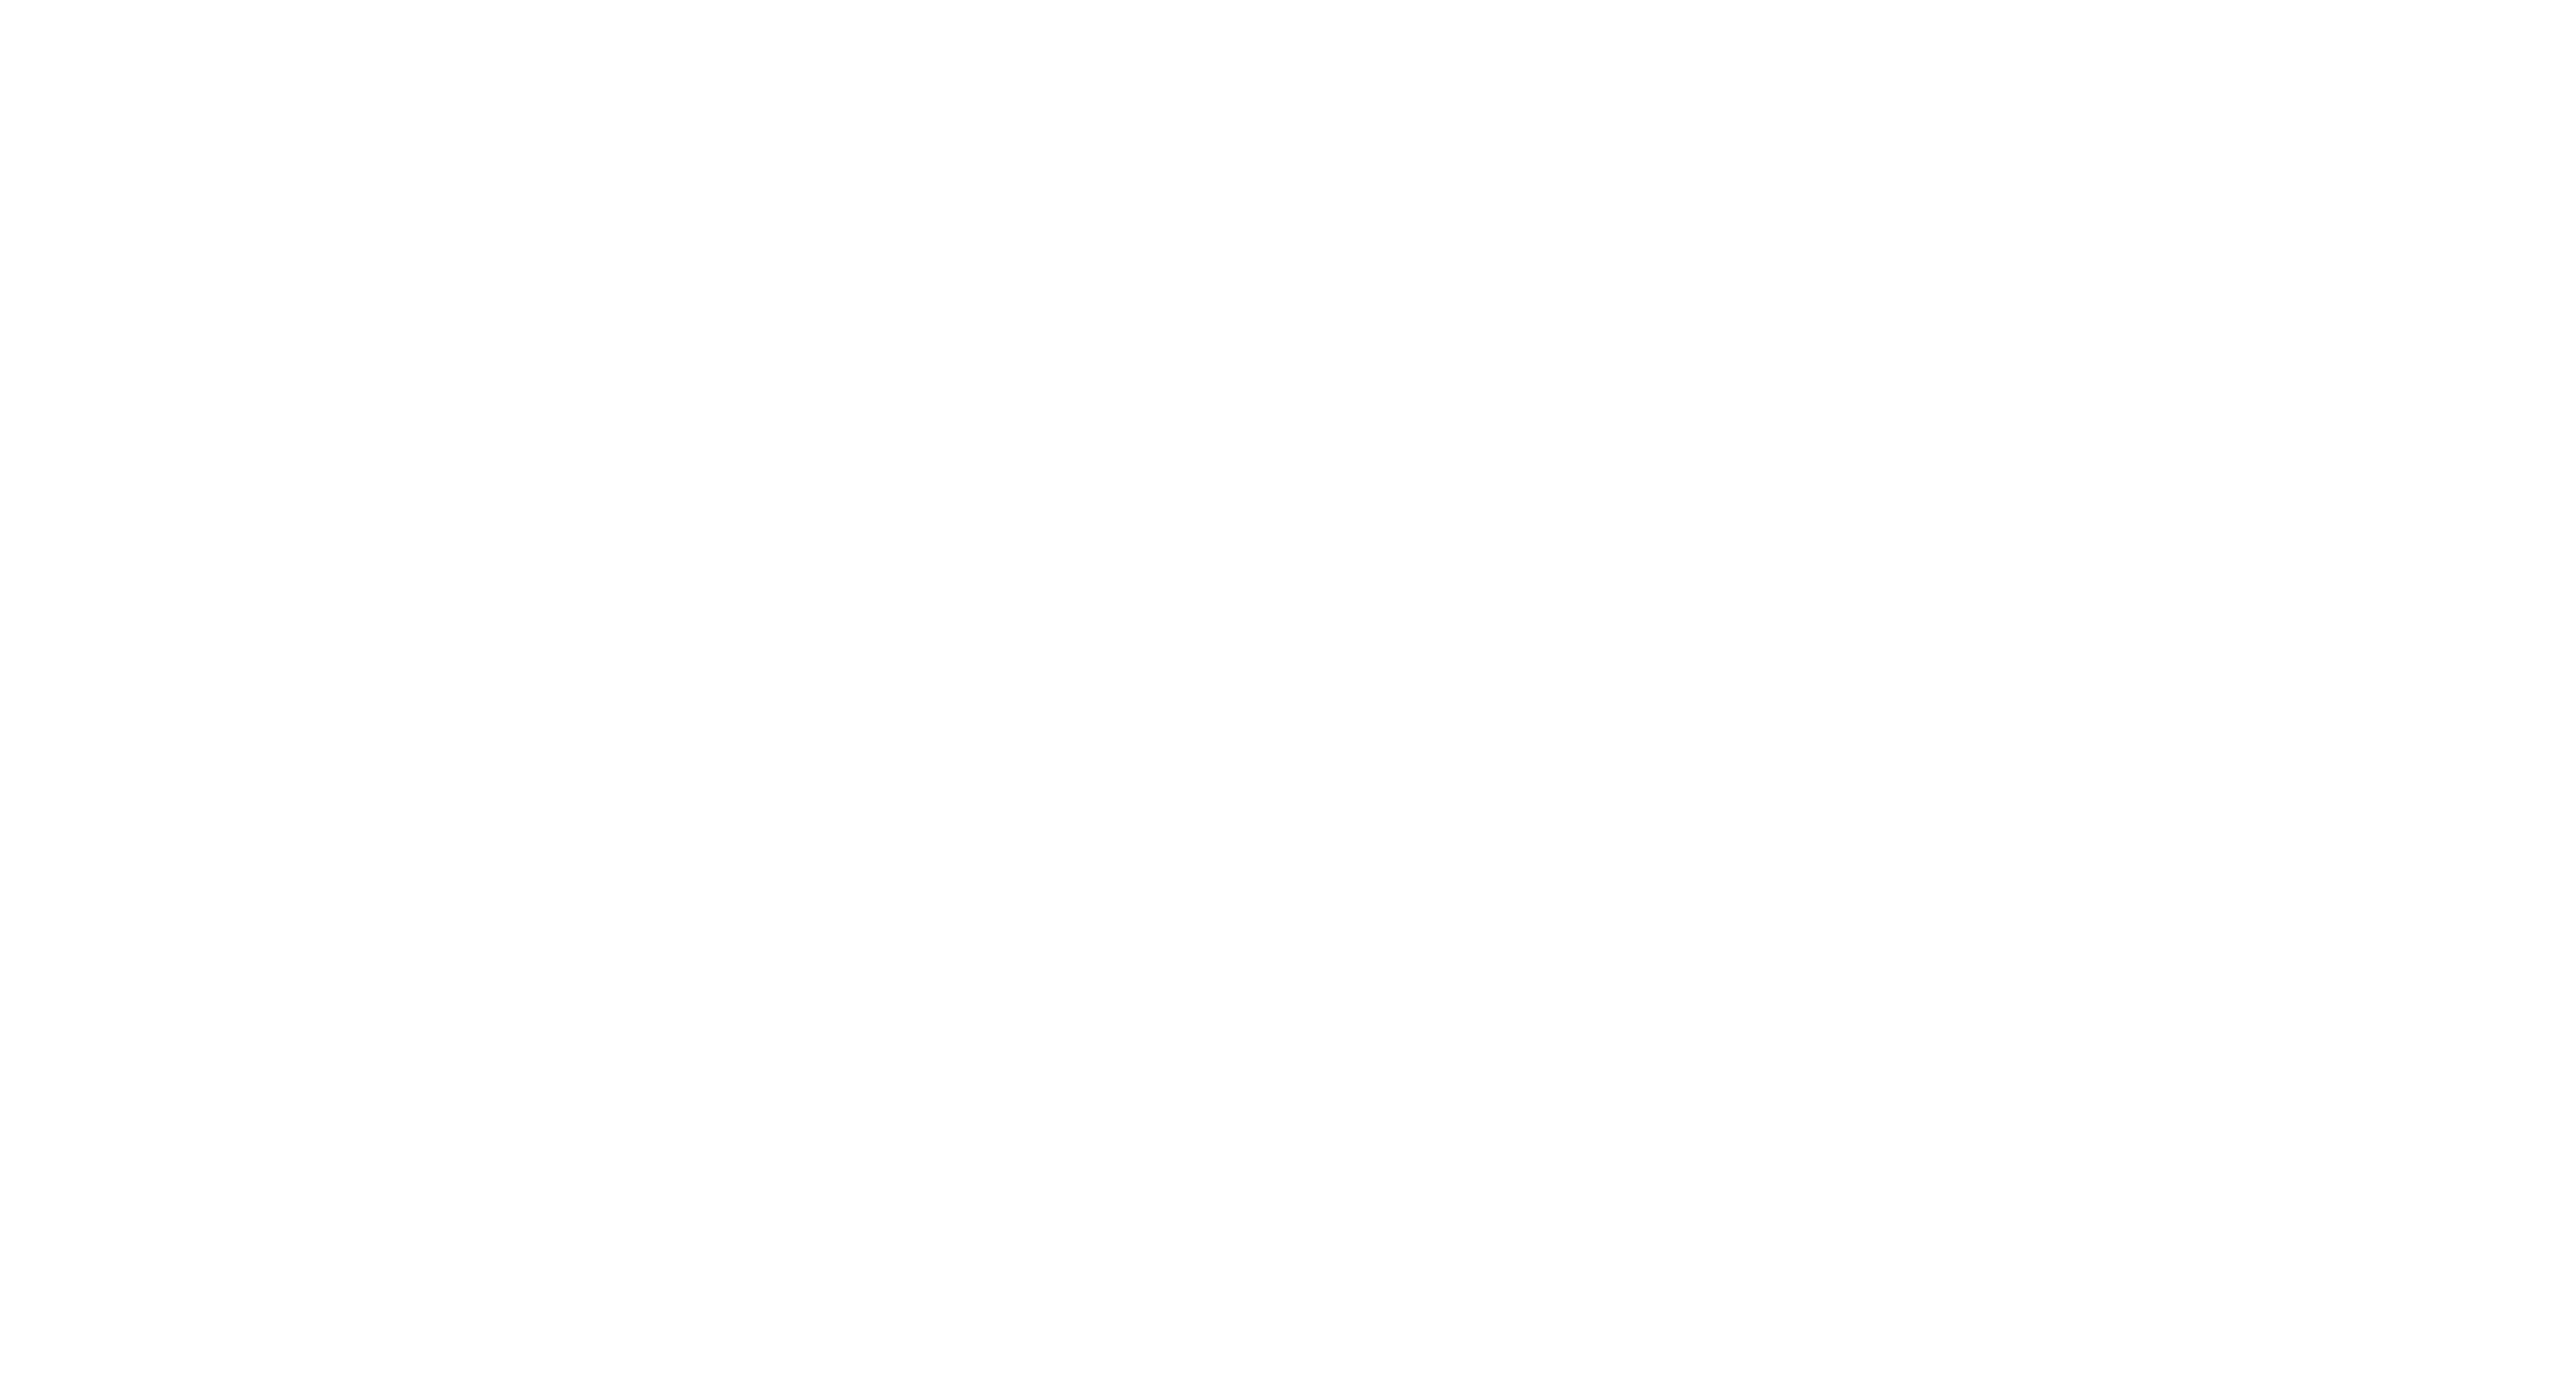 Cloud PNG Transparent Image - Cloud PNG